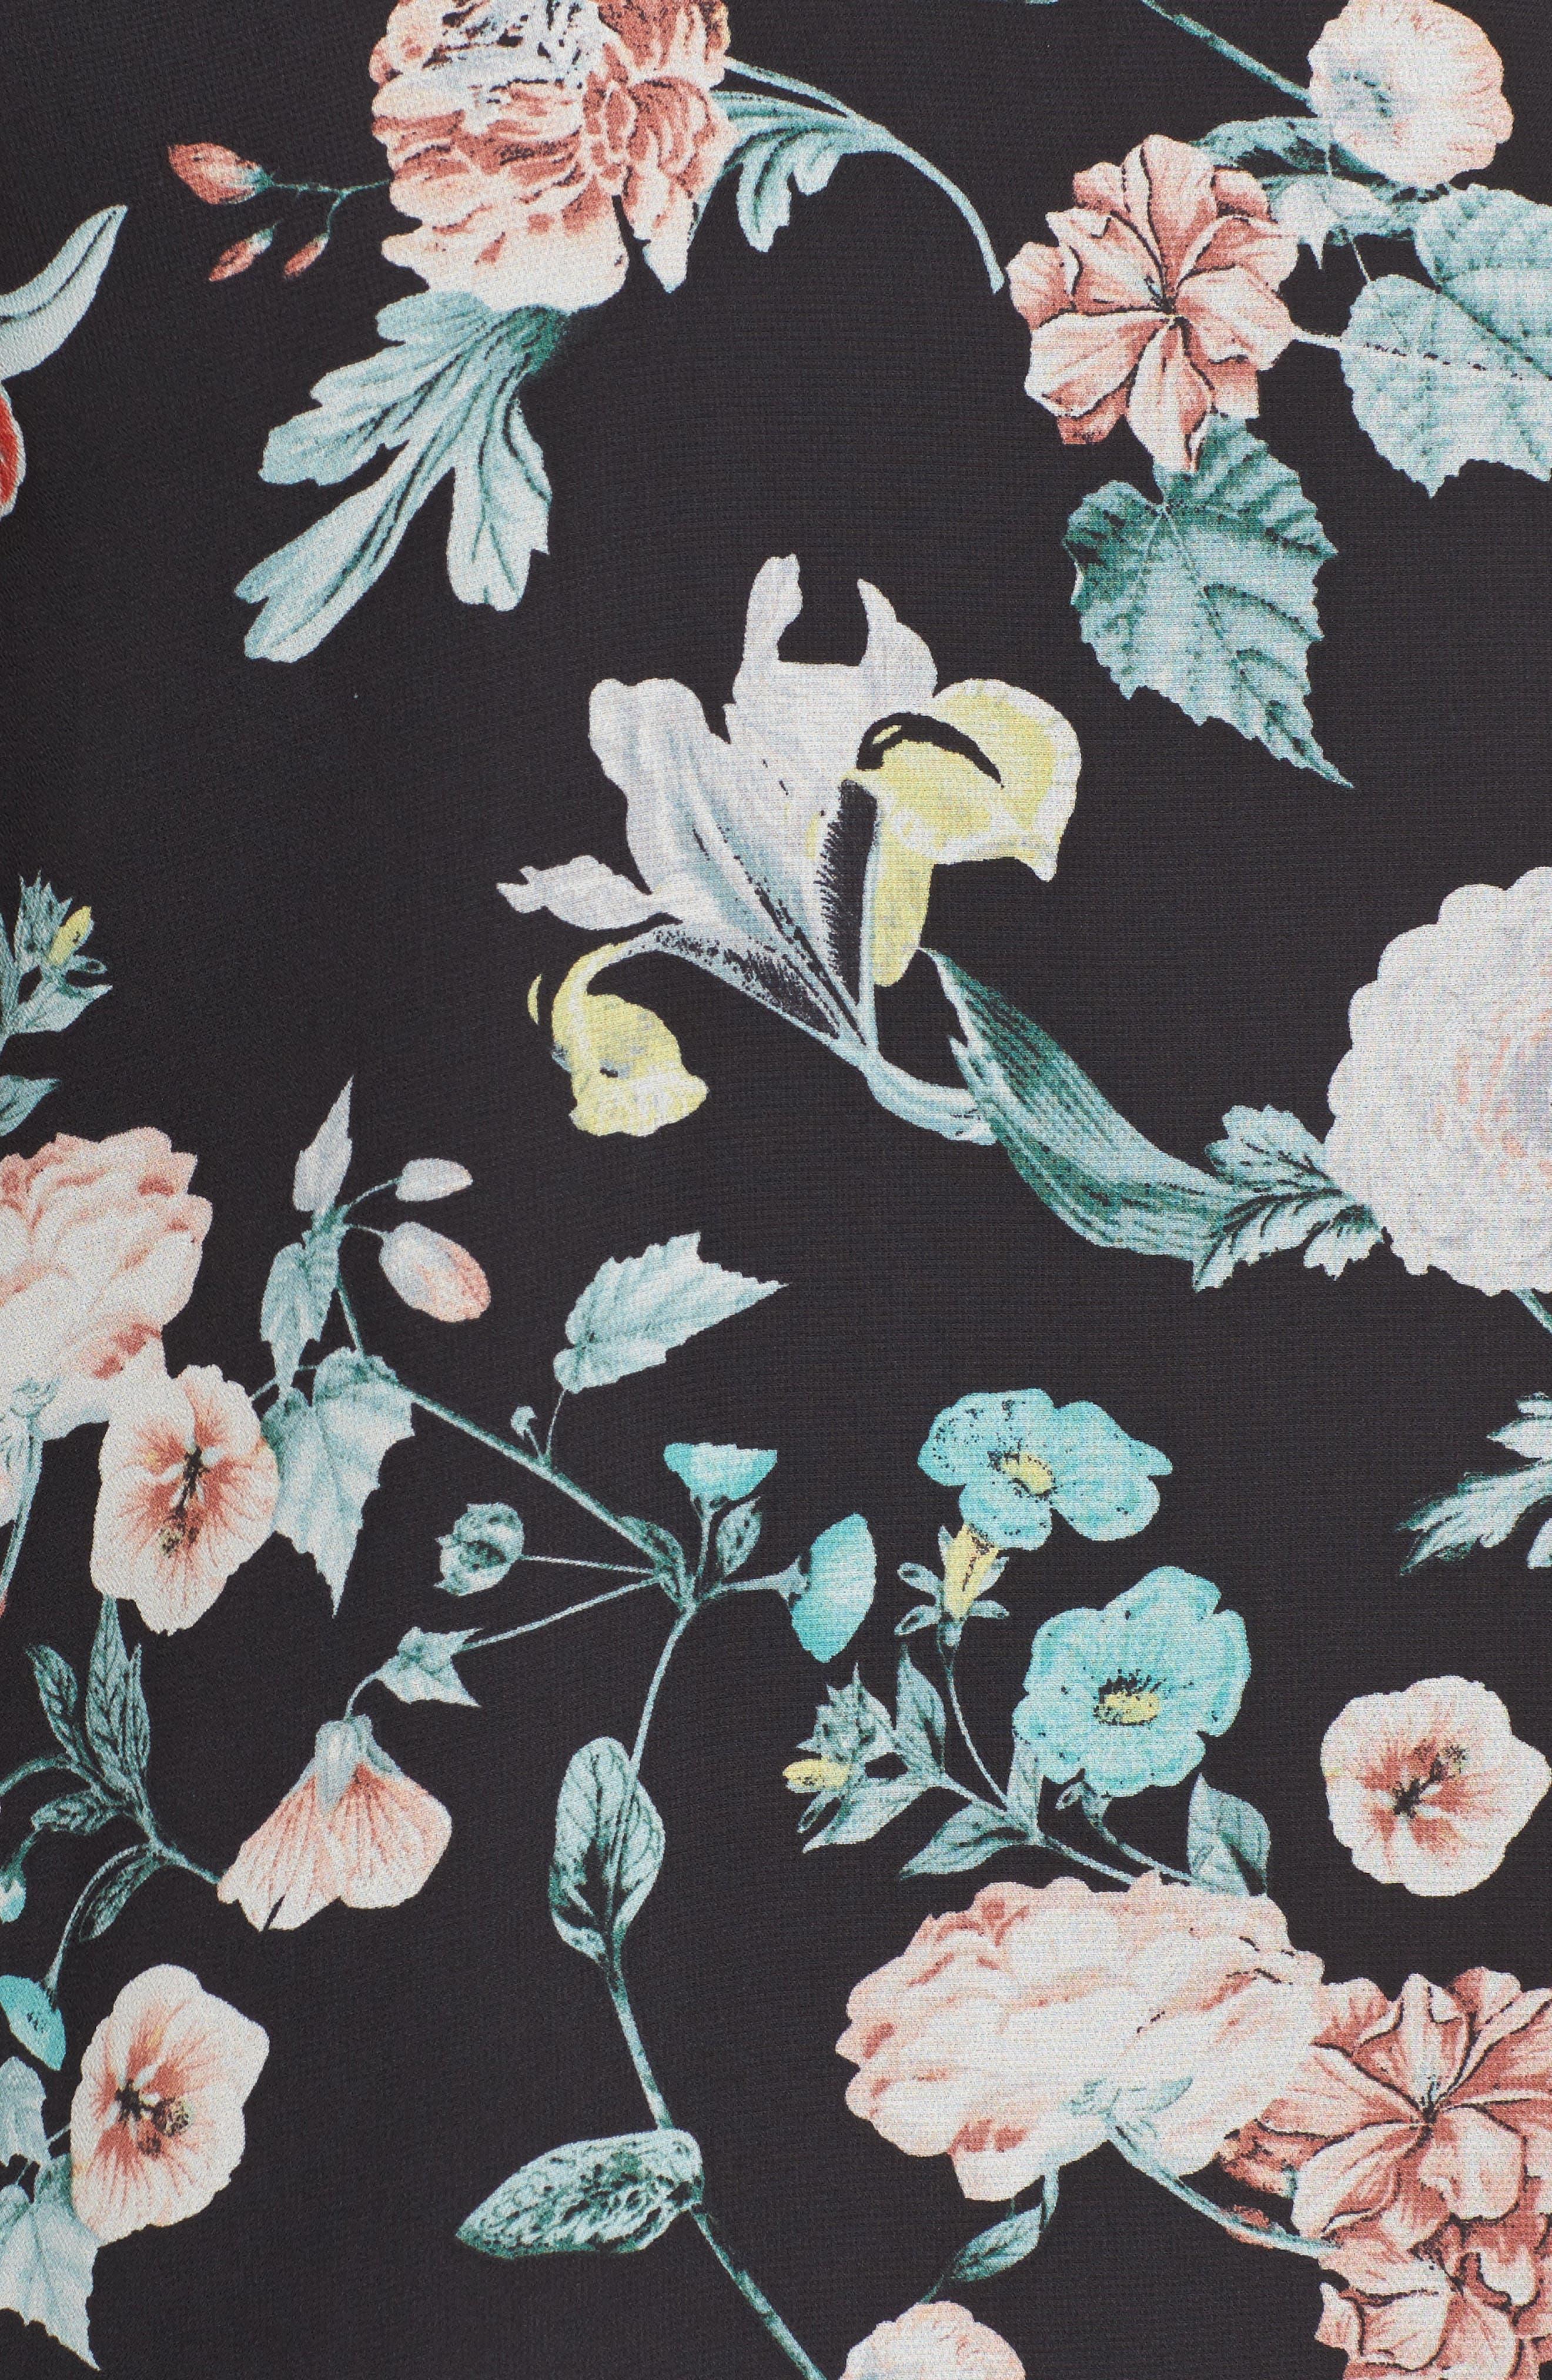 Floral Gardens Drawstring Sleeve Blouse,                             Alternate thumbnail 5, color,                             006